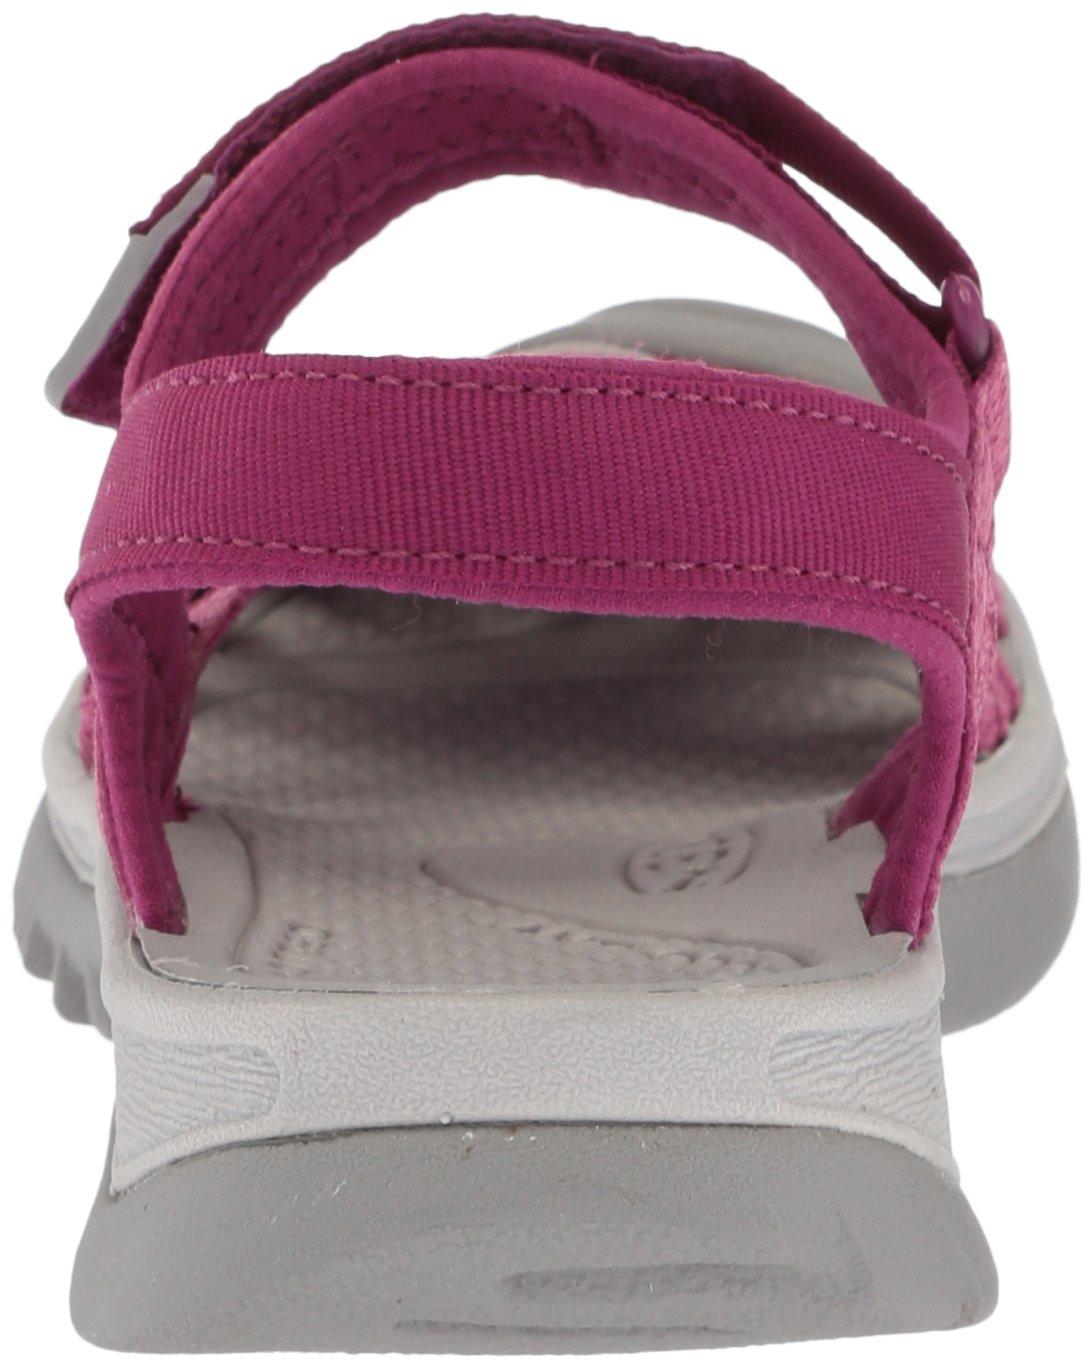 KEEN Women's Rose Sandal B06ZYHF9RJ 10 B(M) US|Boysenberry/Red Violet